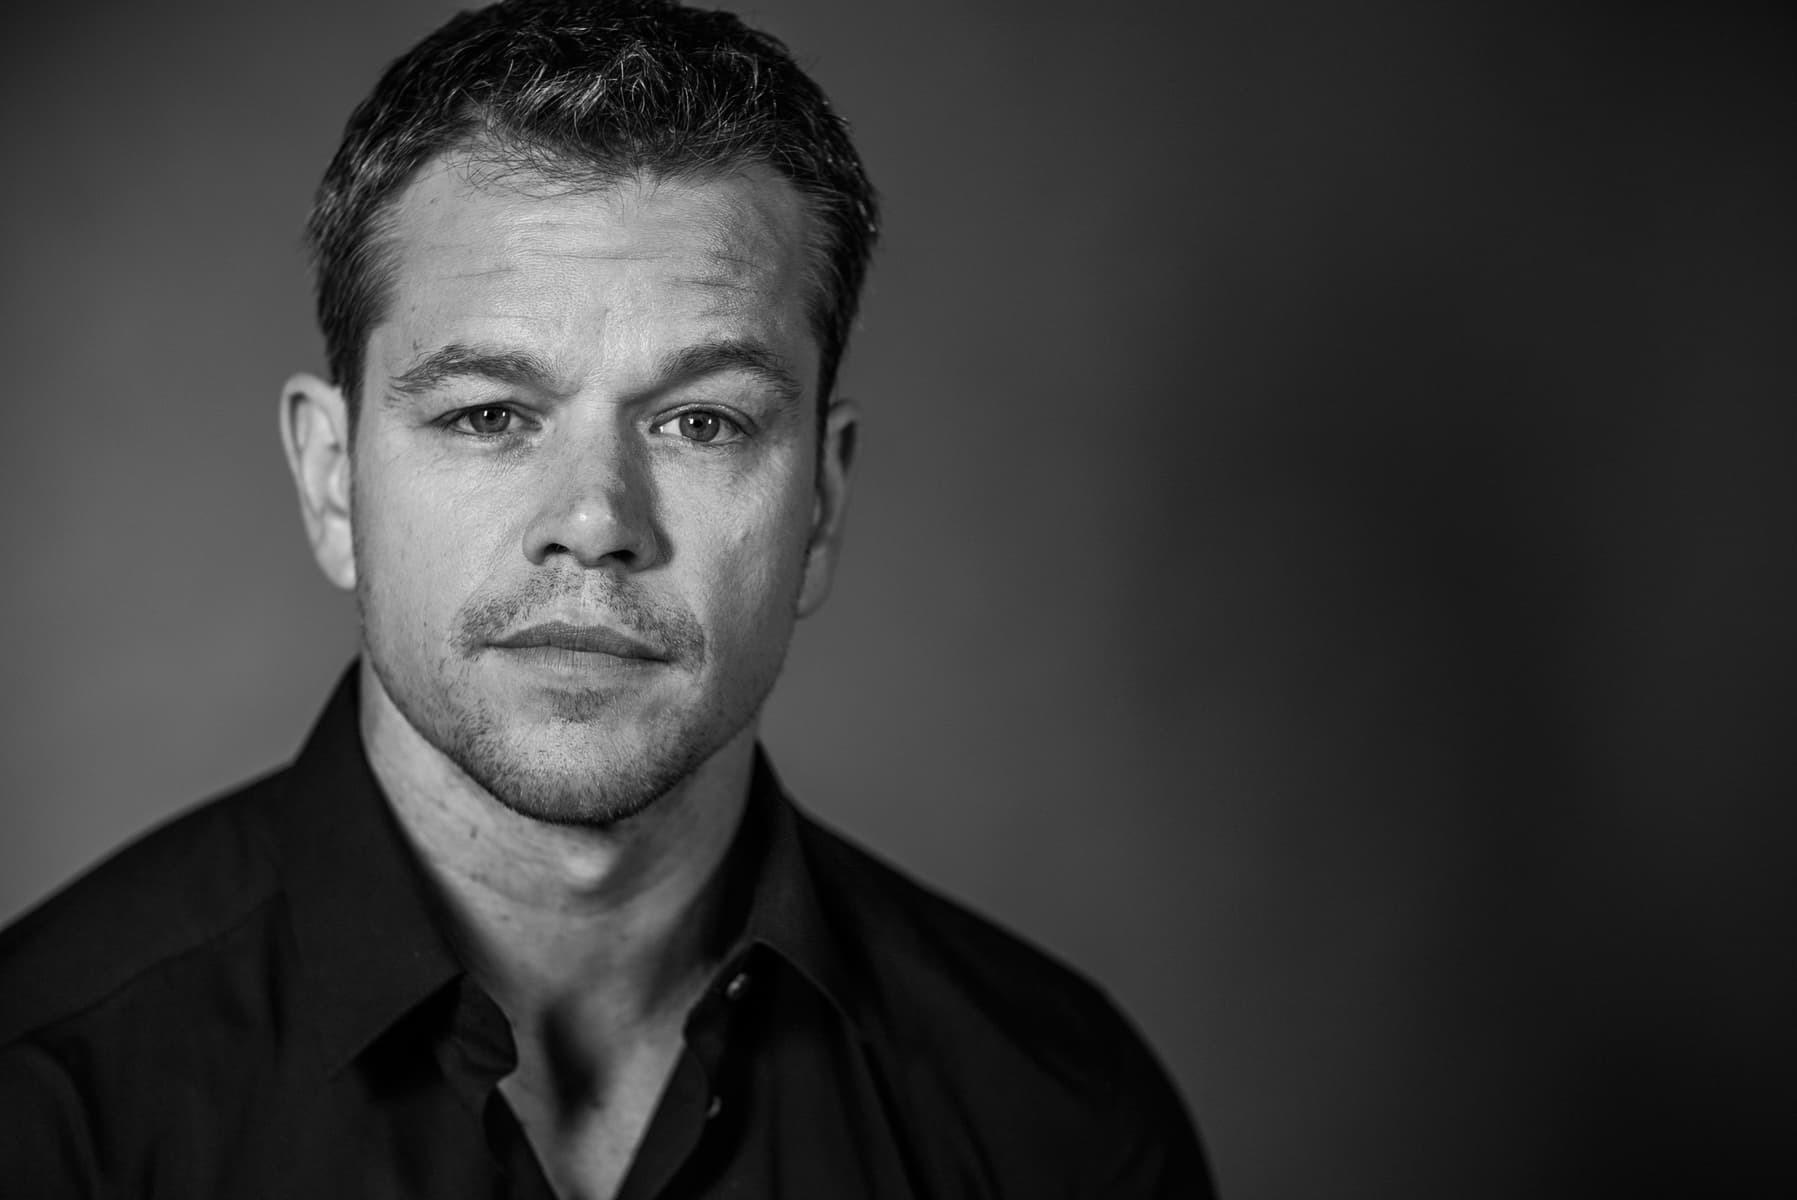 Matt Damon Background